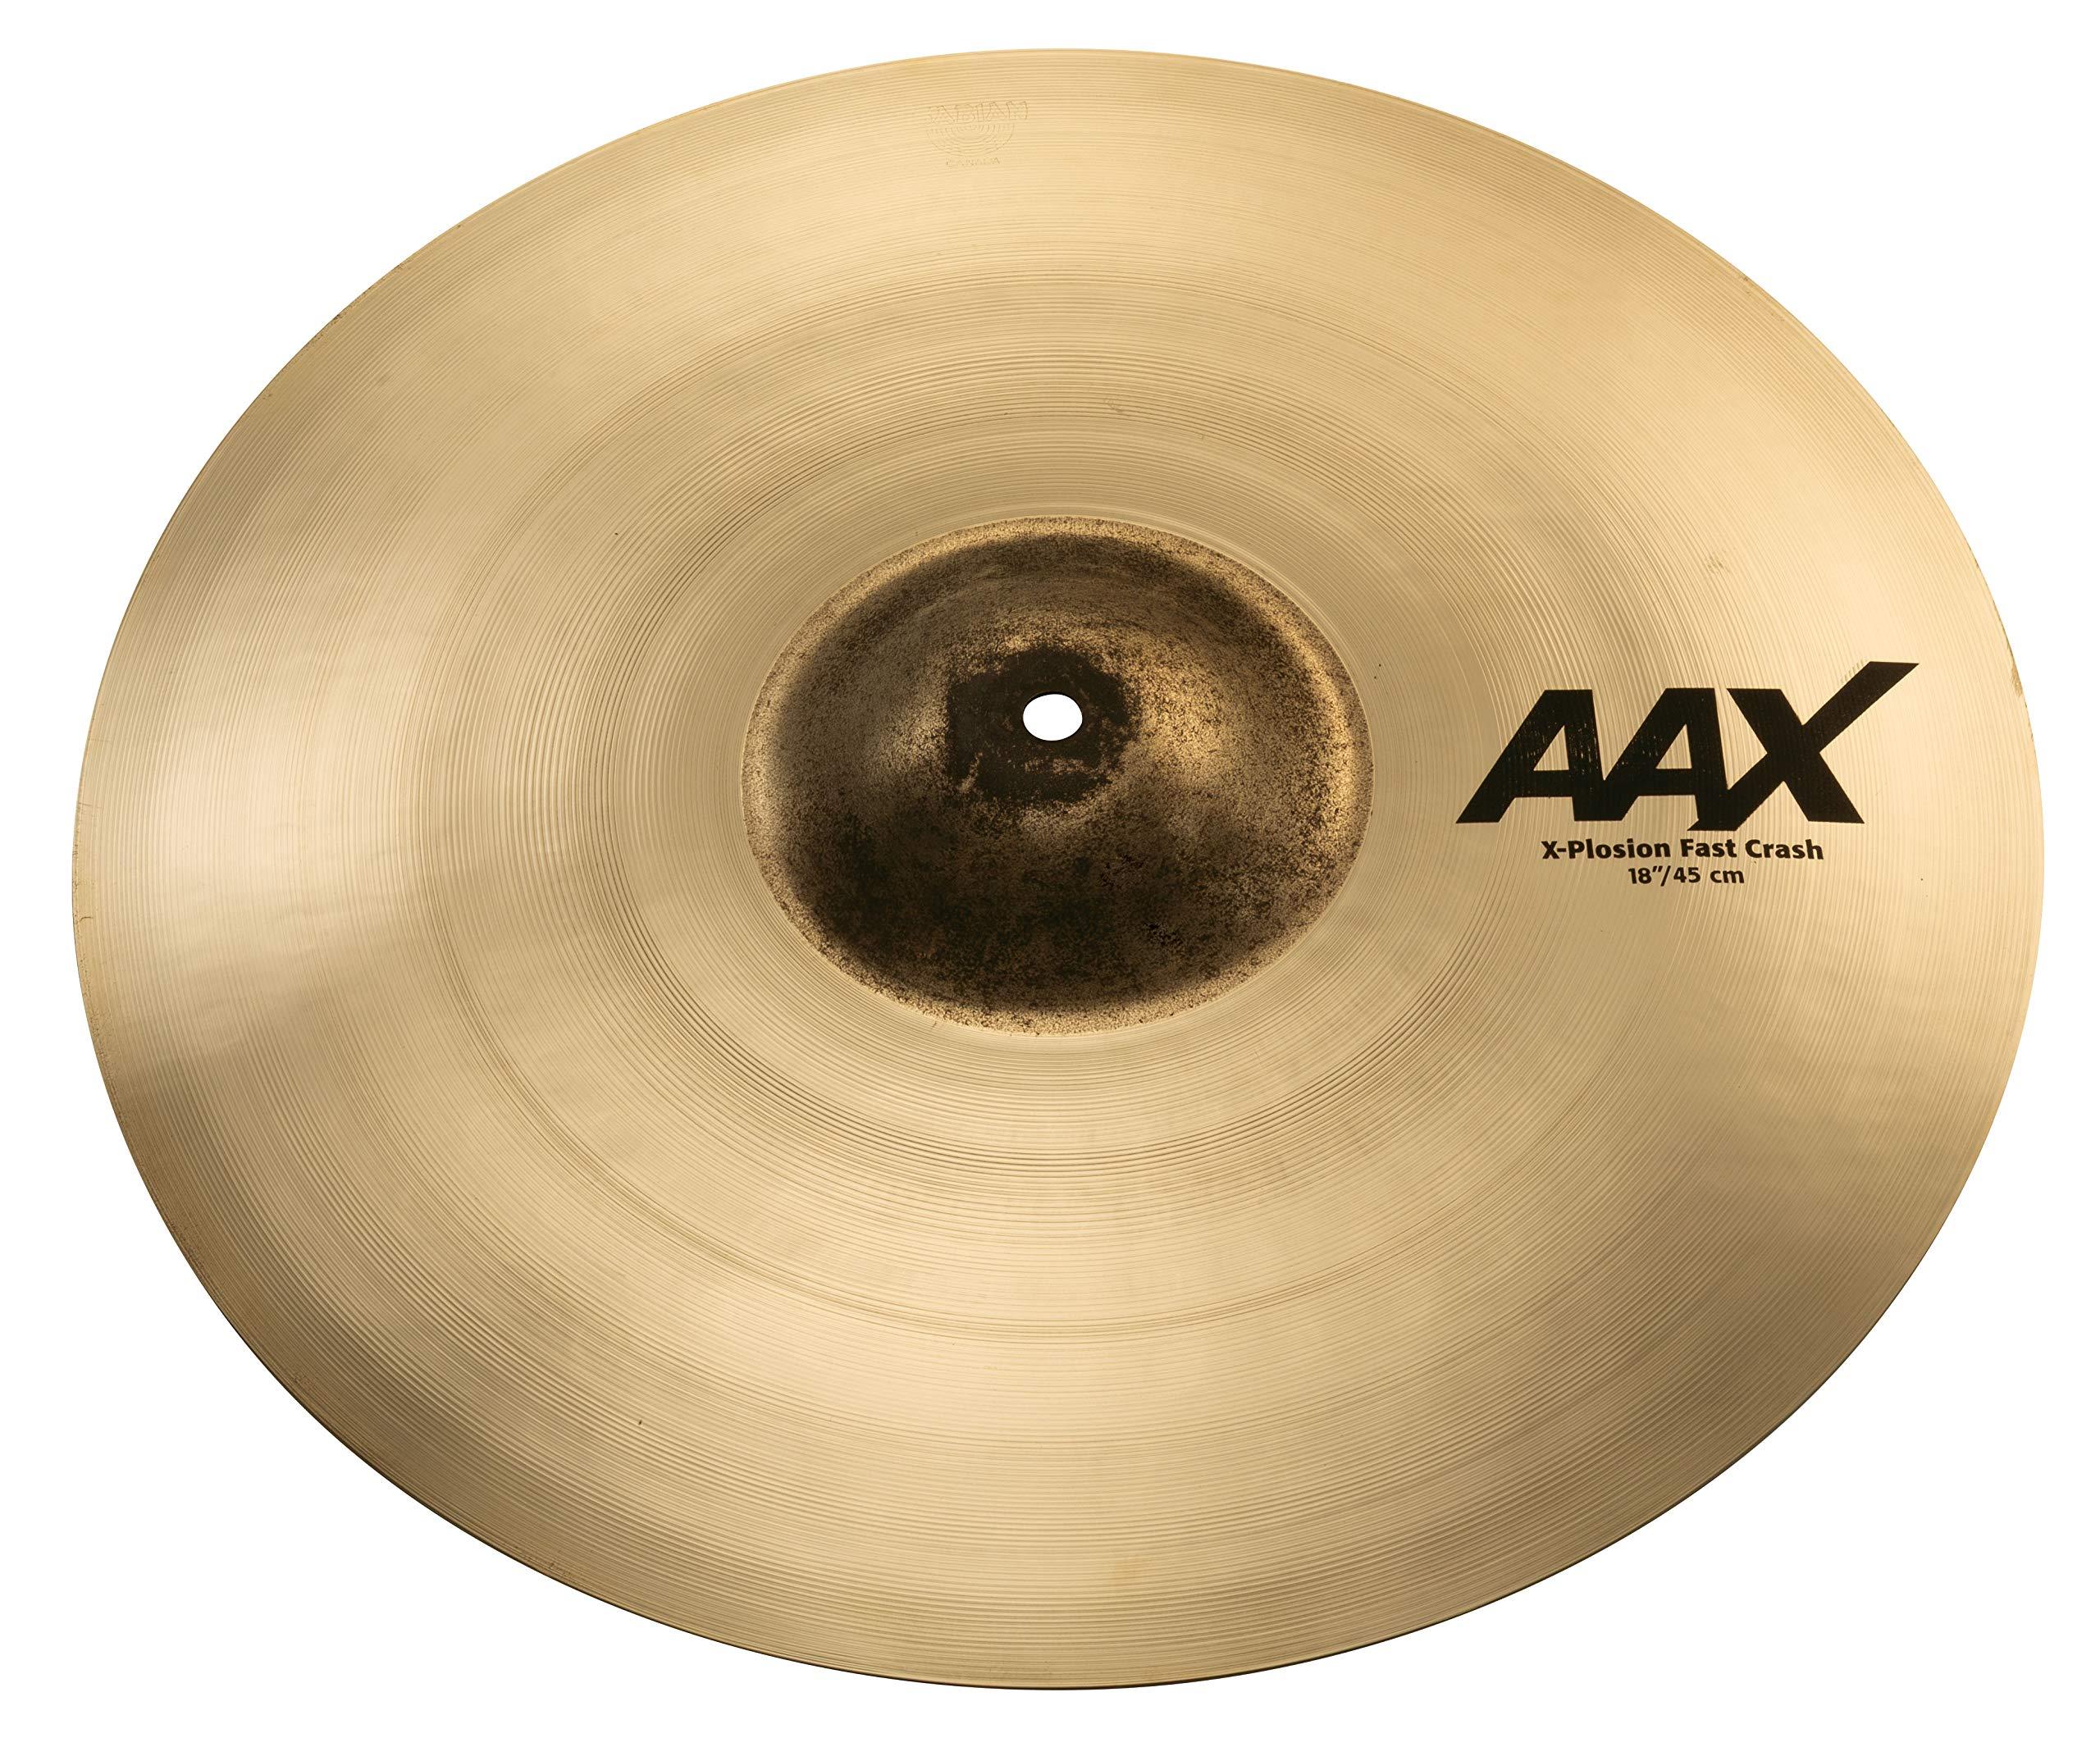 Sabian AAX 18'' X-Plosion Fast Crash Cymbal, Brilliant Finish by Sabian